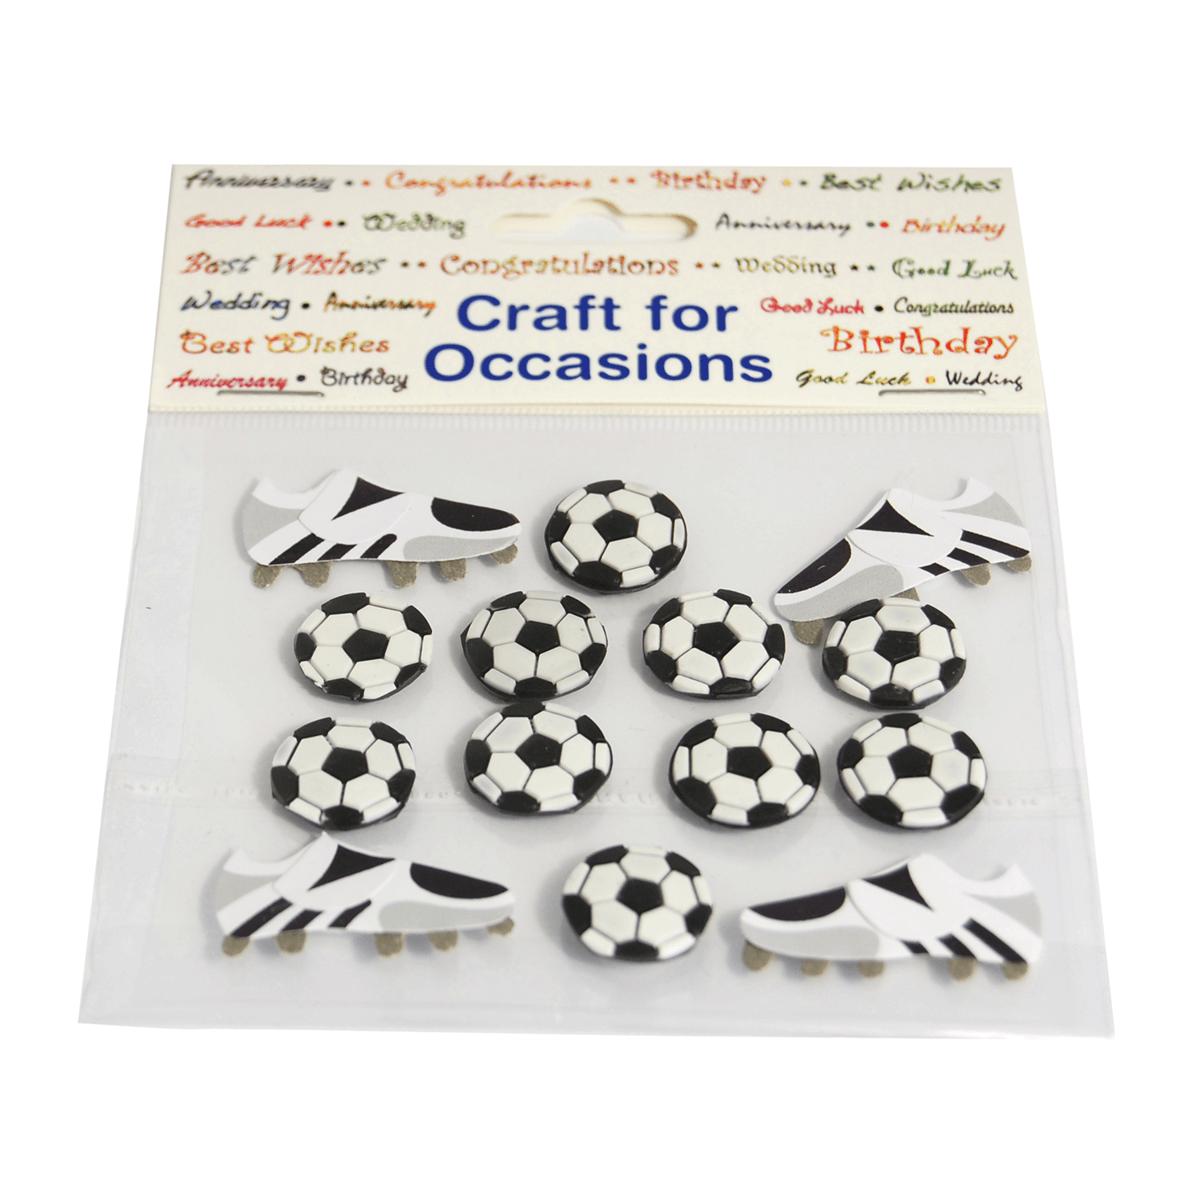 14 x Football Boots & Balls Embellishments Craft